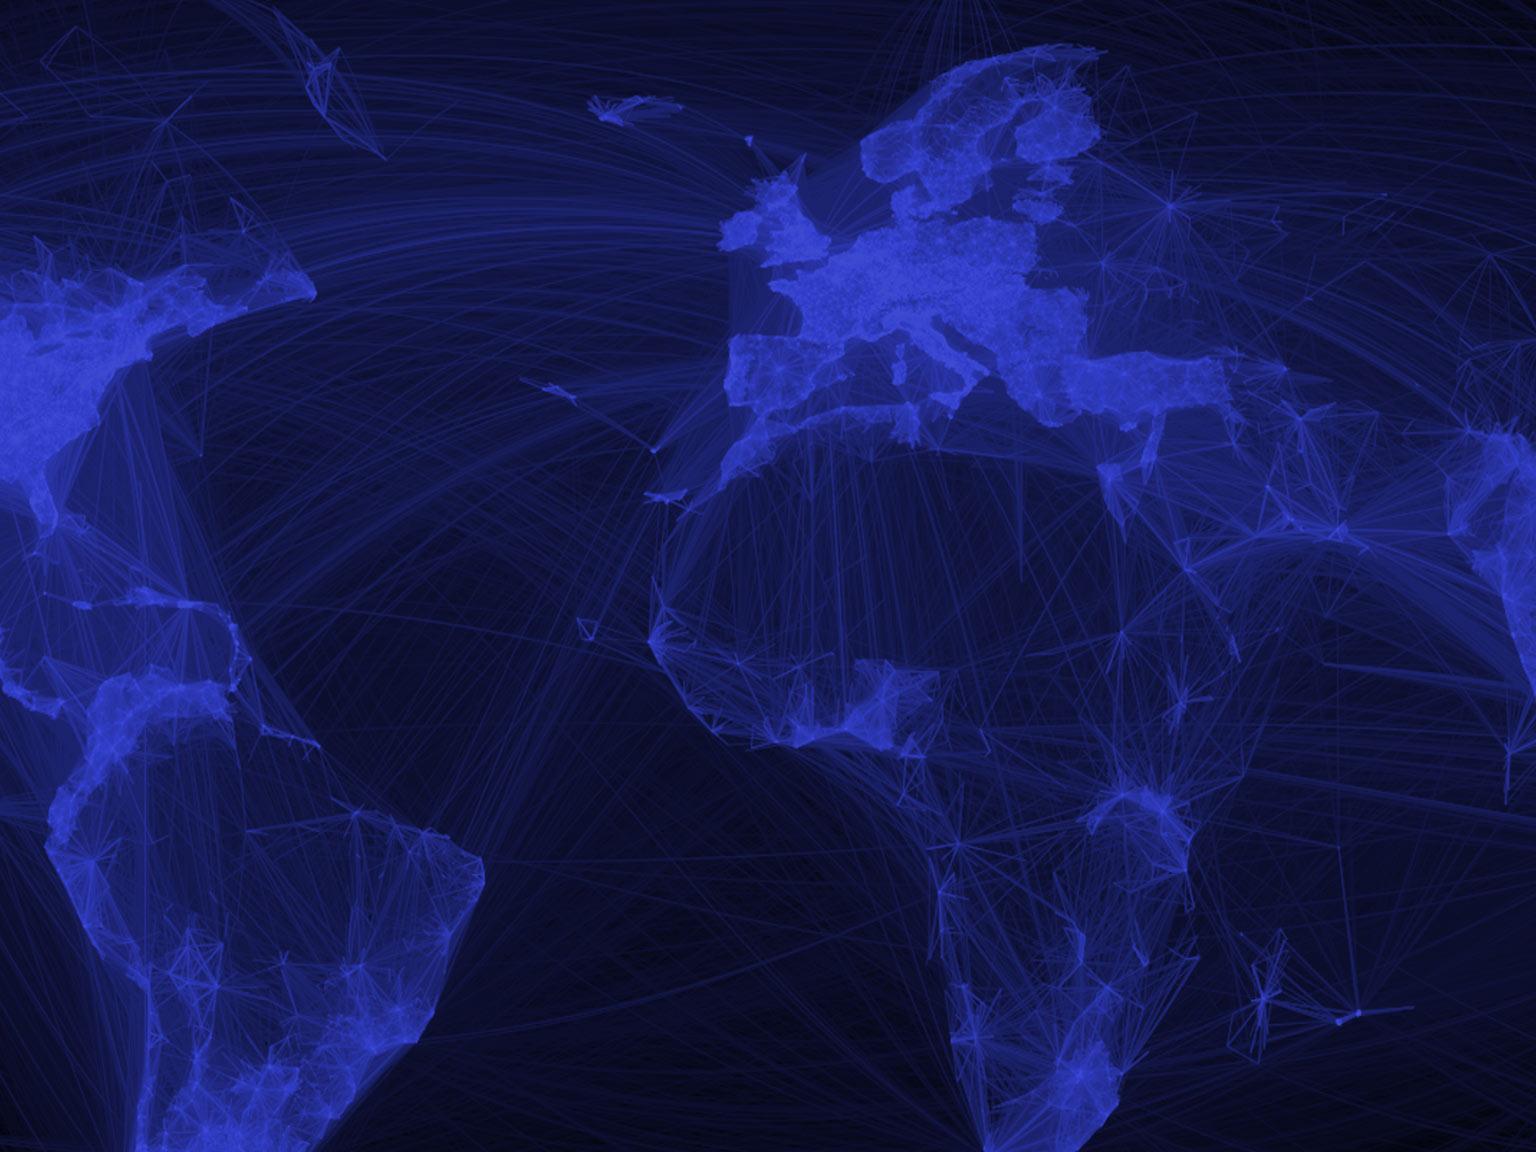 ei internet report